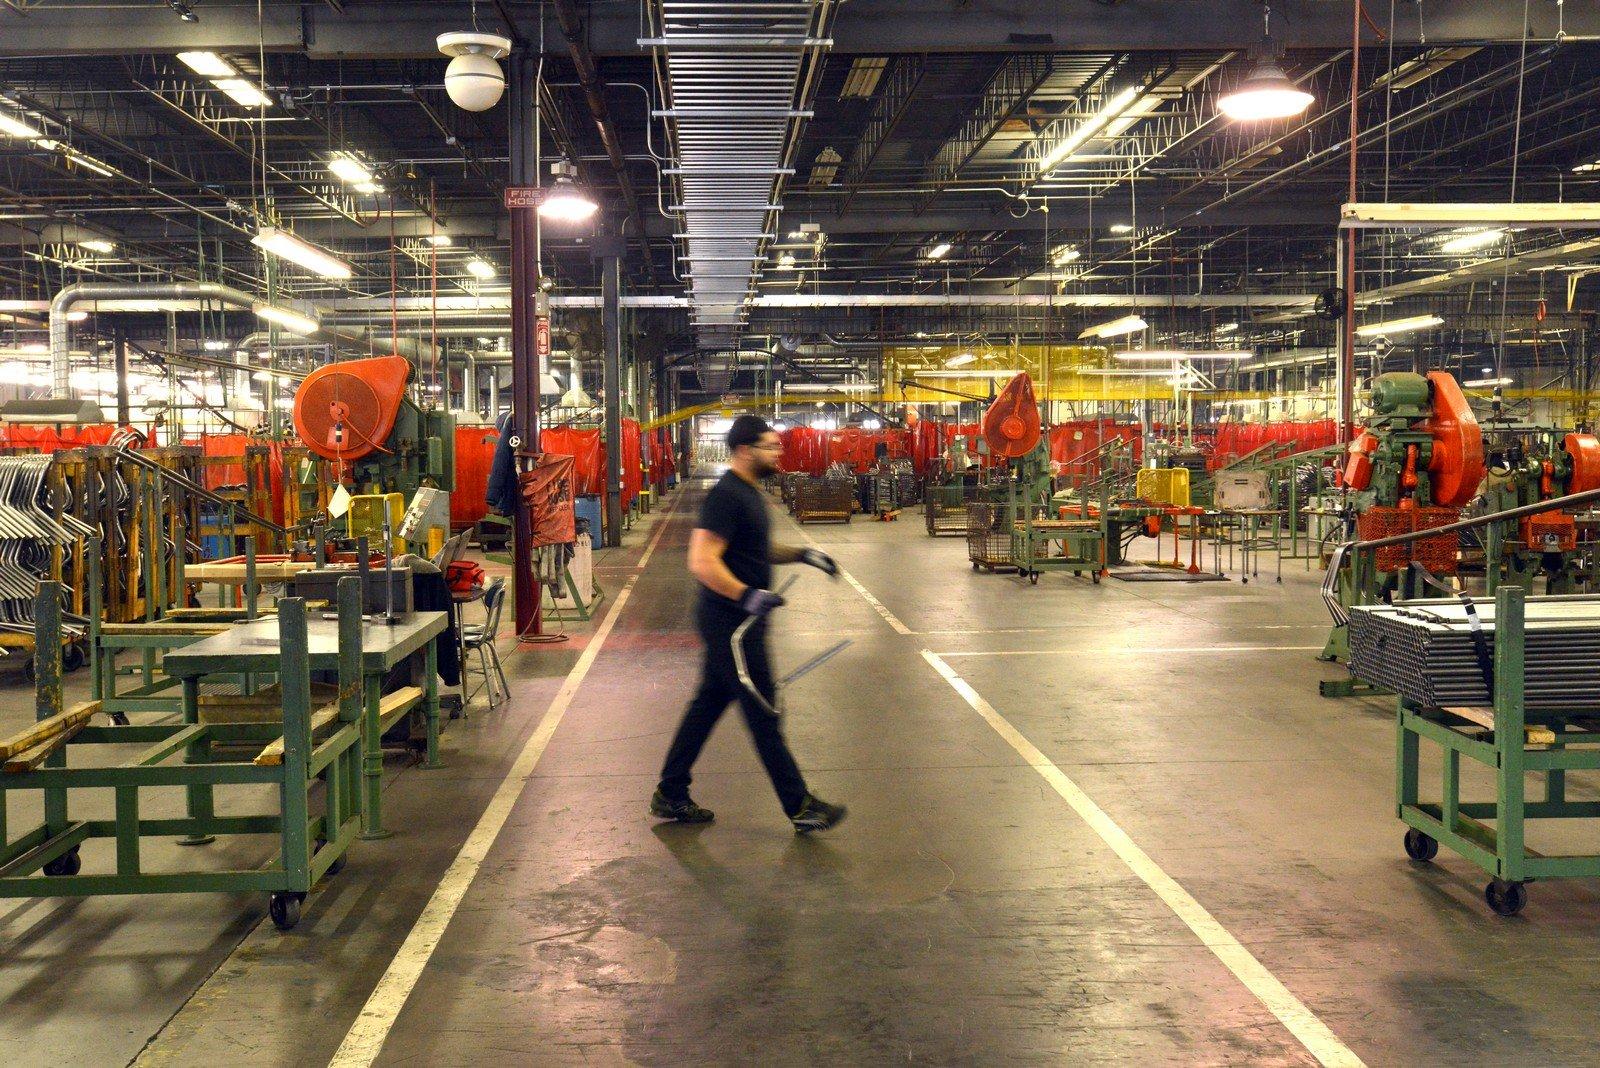 Columbia Mfg Inc factory